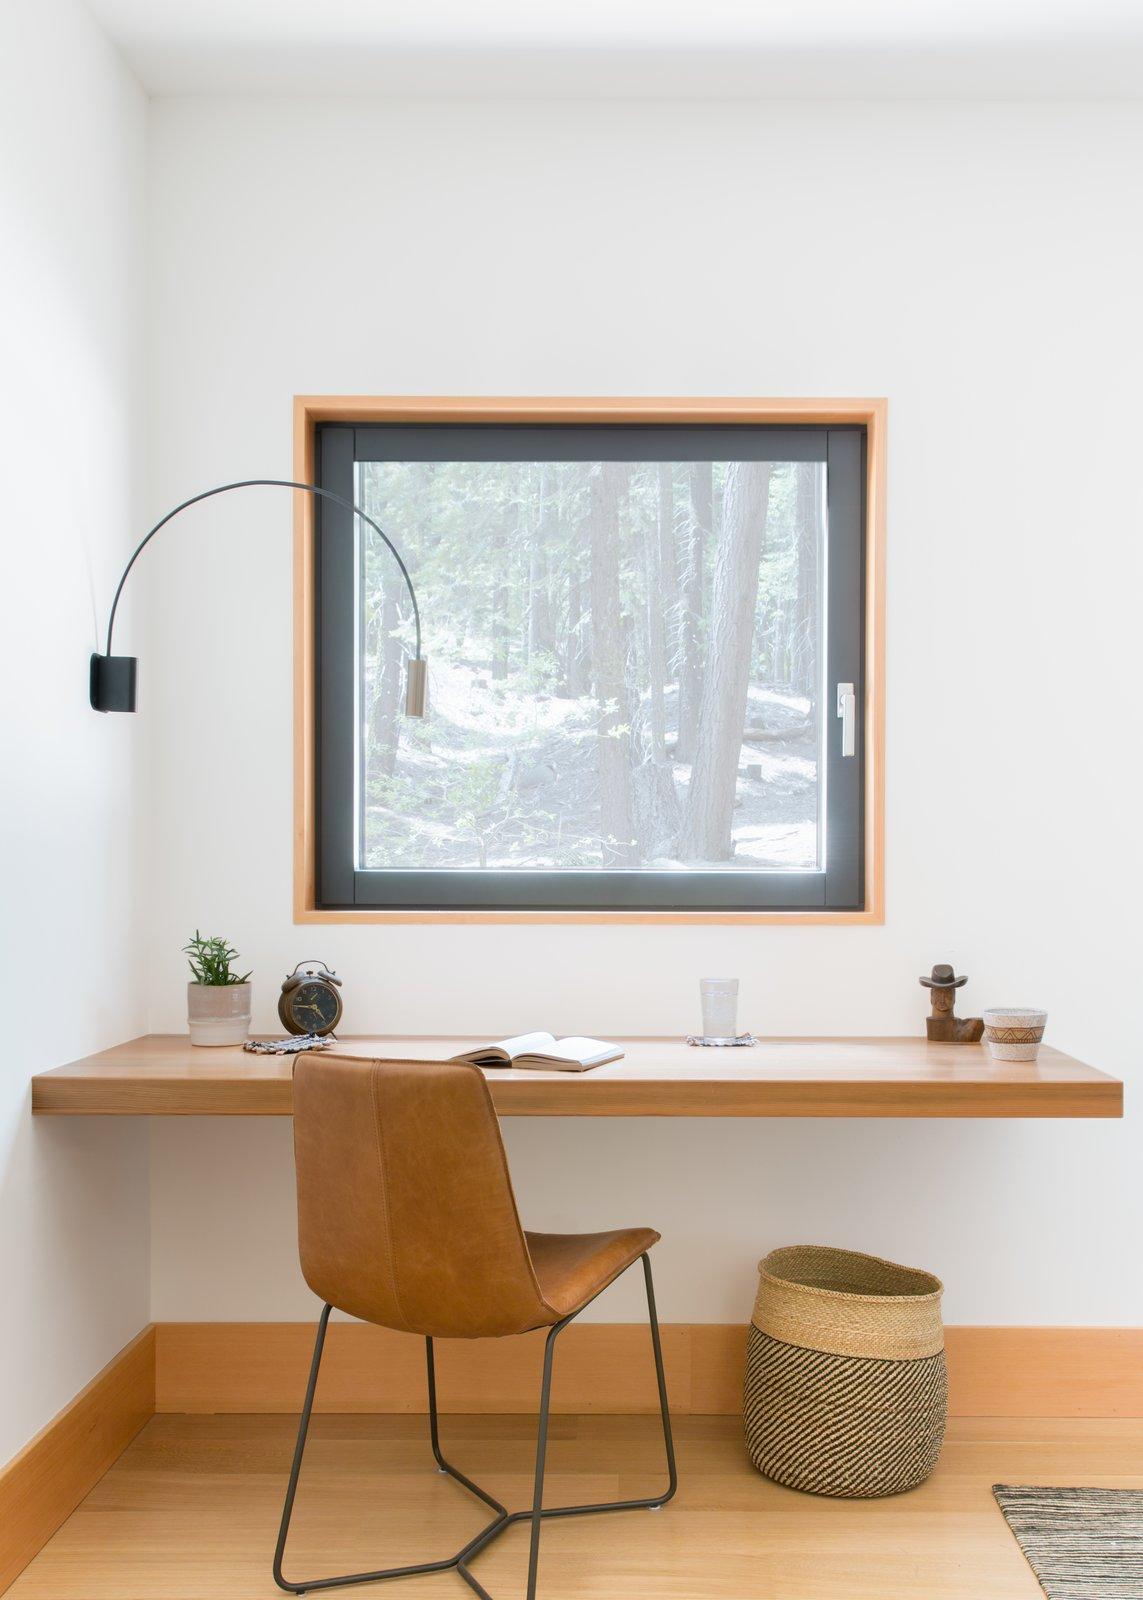 Office, Lamps, Light Hardwood Floor, Desk, and Chair  Woodsy Tahoe Cabin by Regan Baker Design